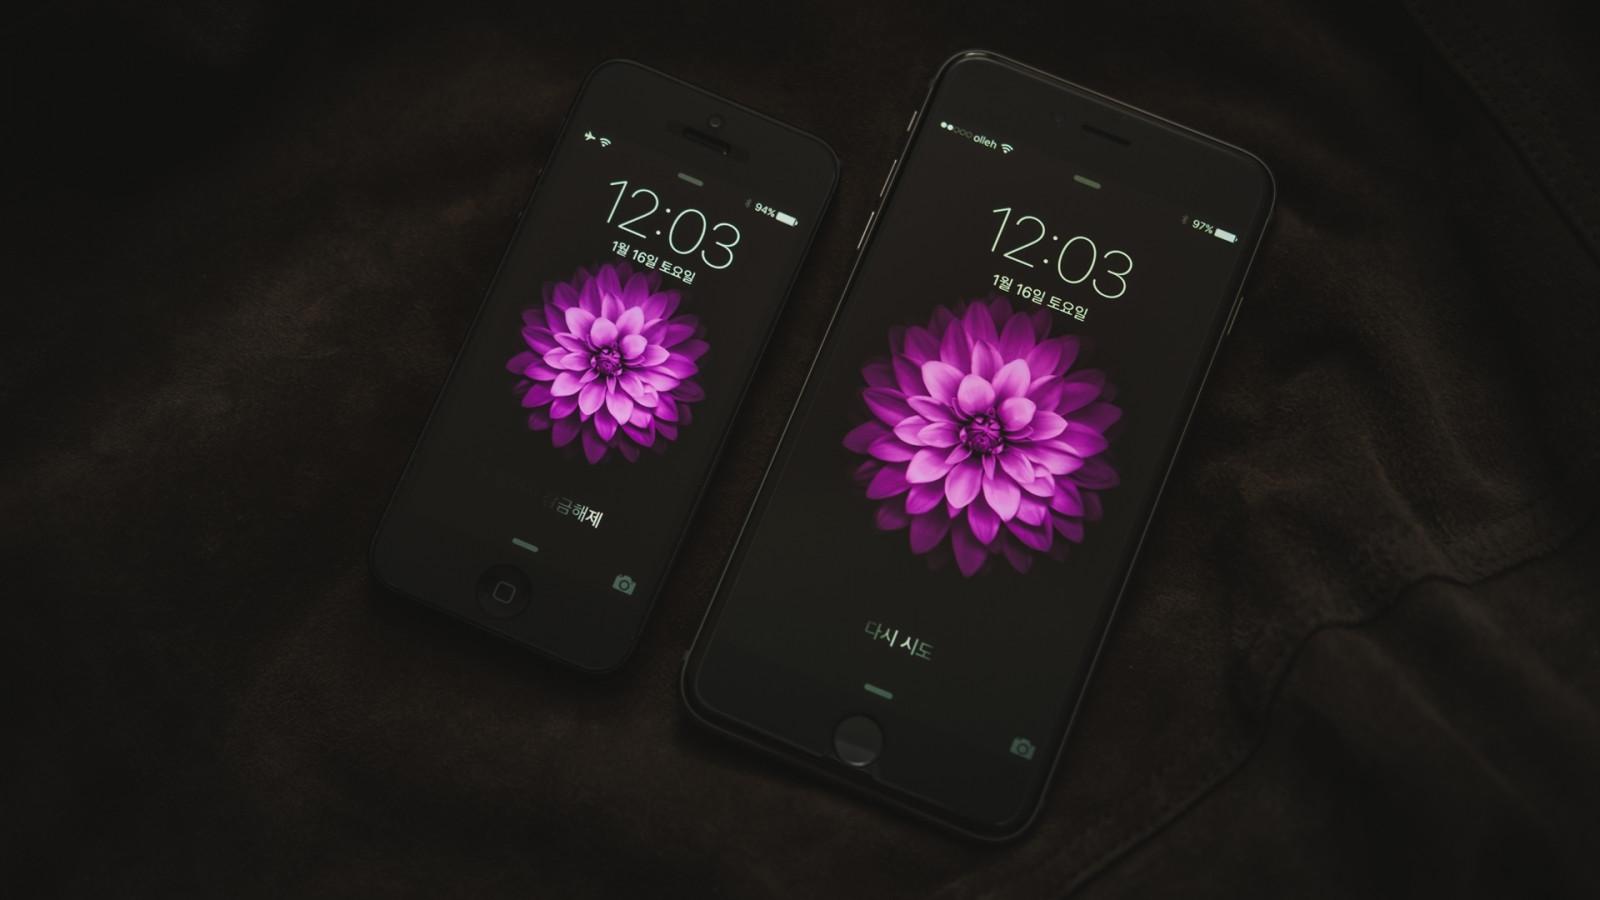 Purple Iphone 6 Wallpaper 14276 Wallpaper: Wallpaper : Black, Purple, IPhone 6, Electronics, Color